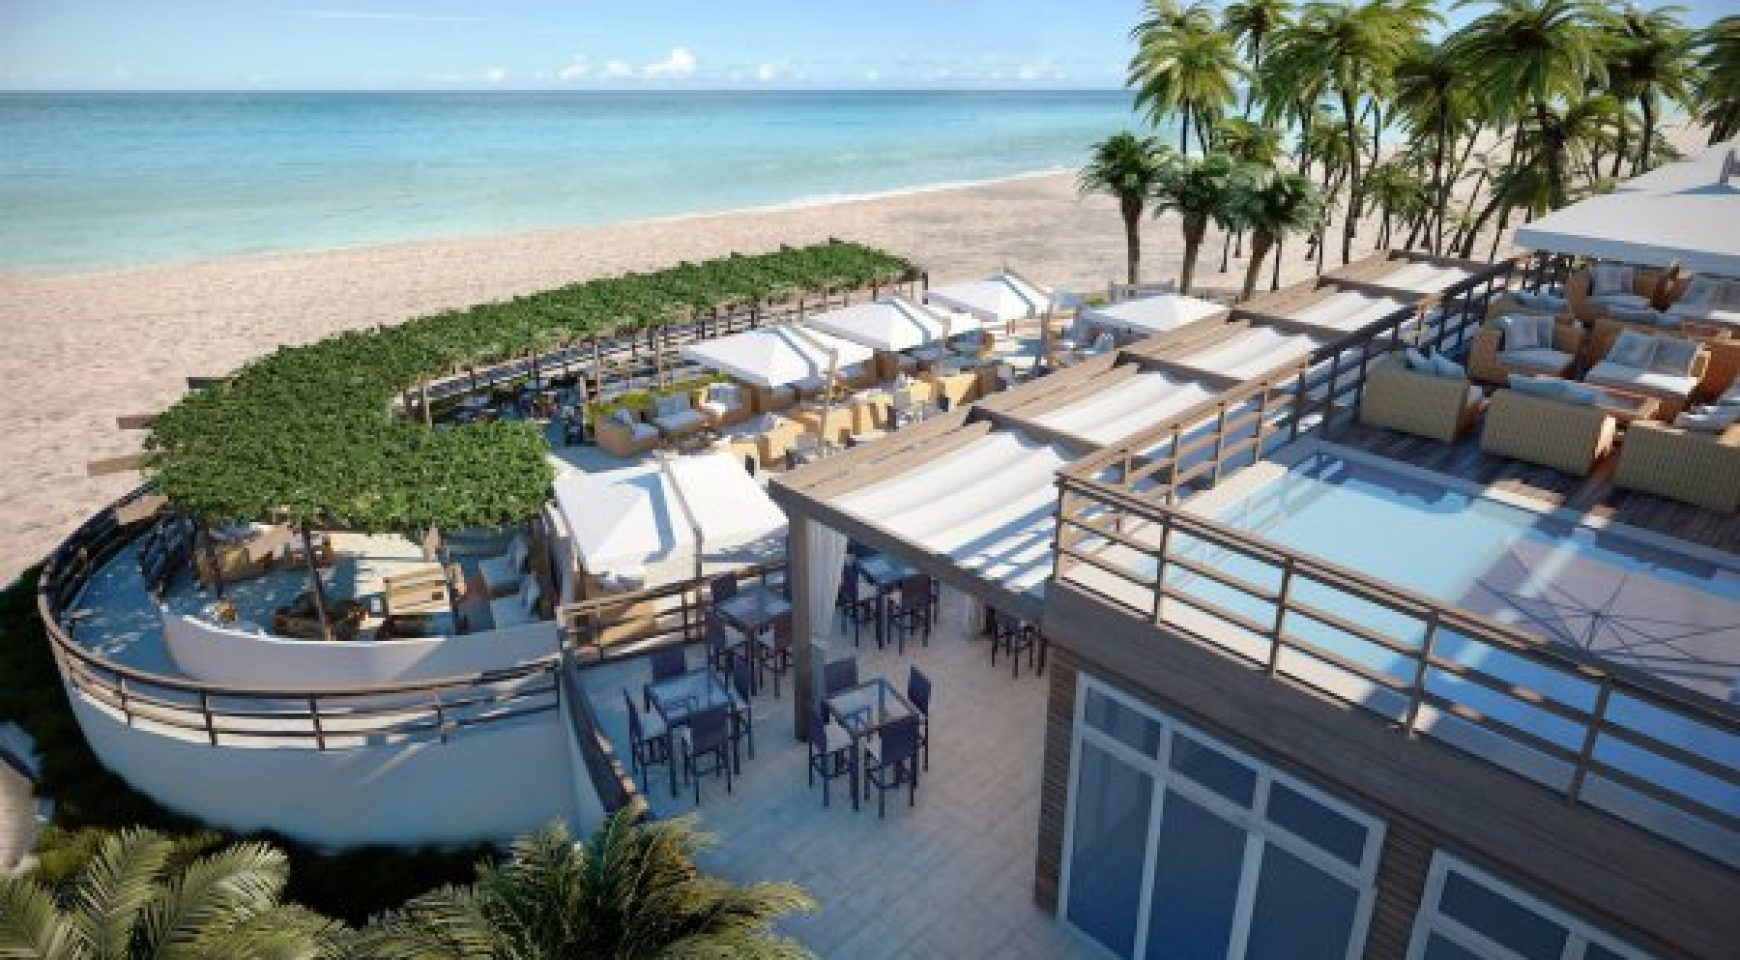 Beach One Hallendale Florida